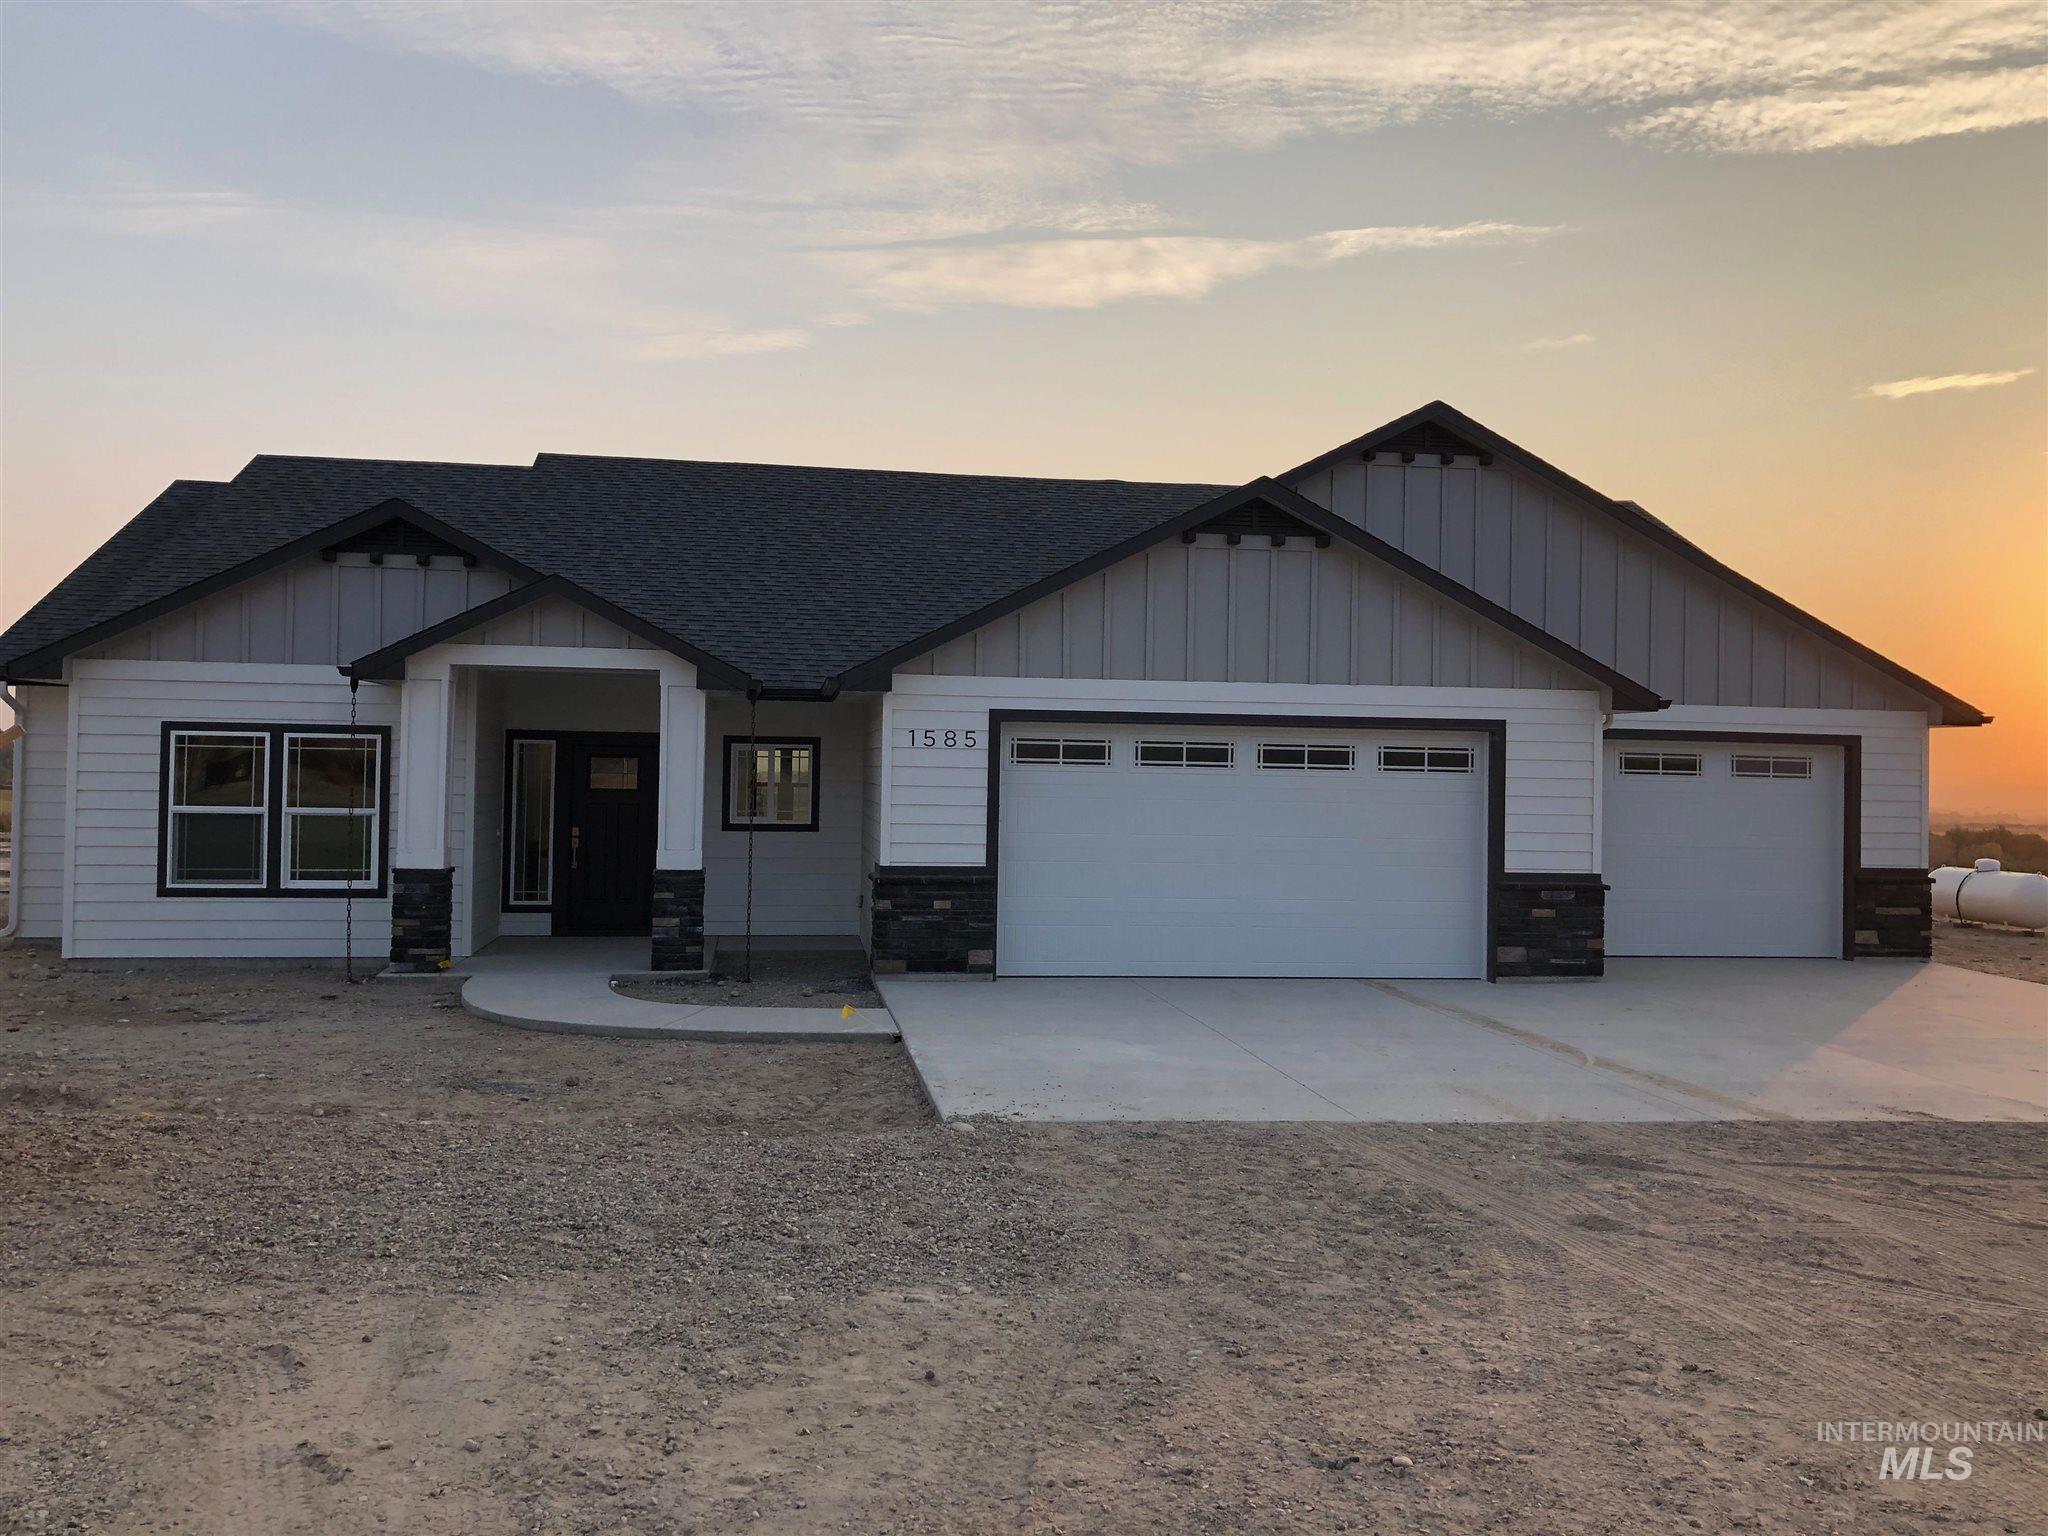 10879 N Iowa Property Photo